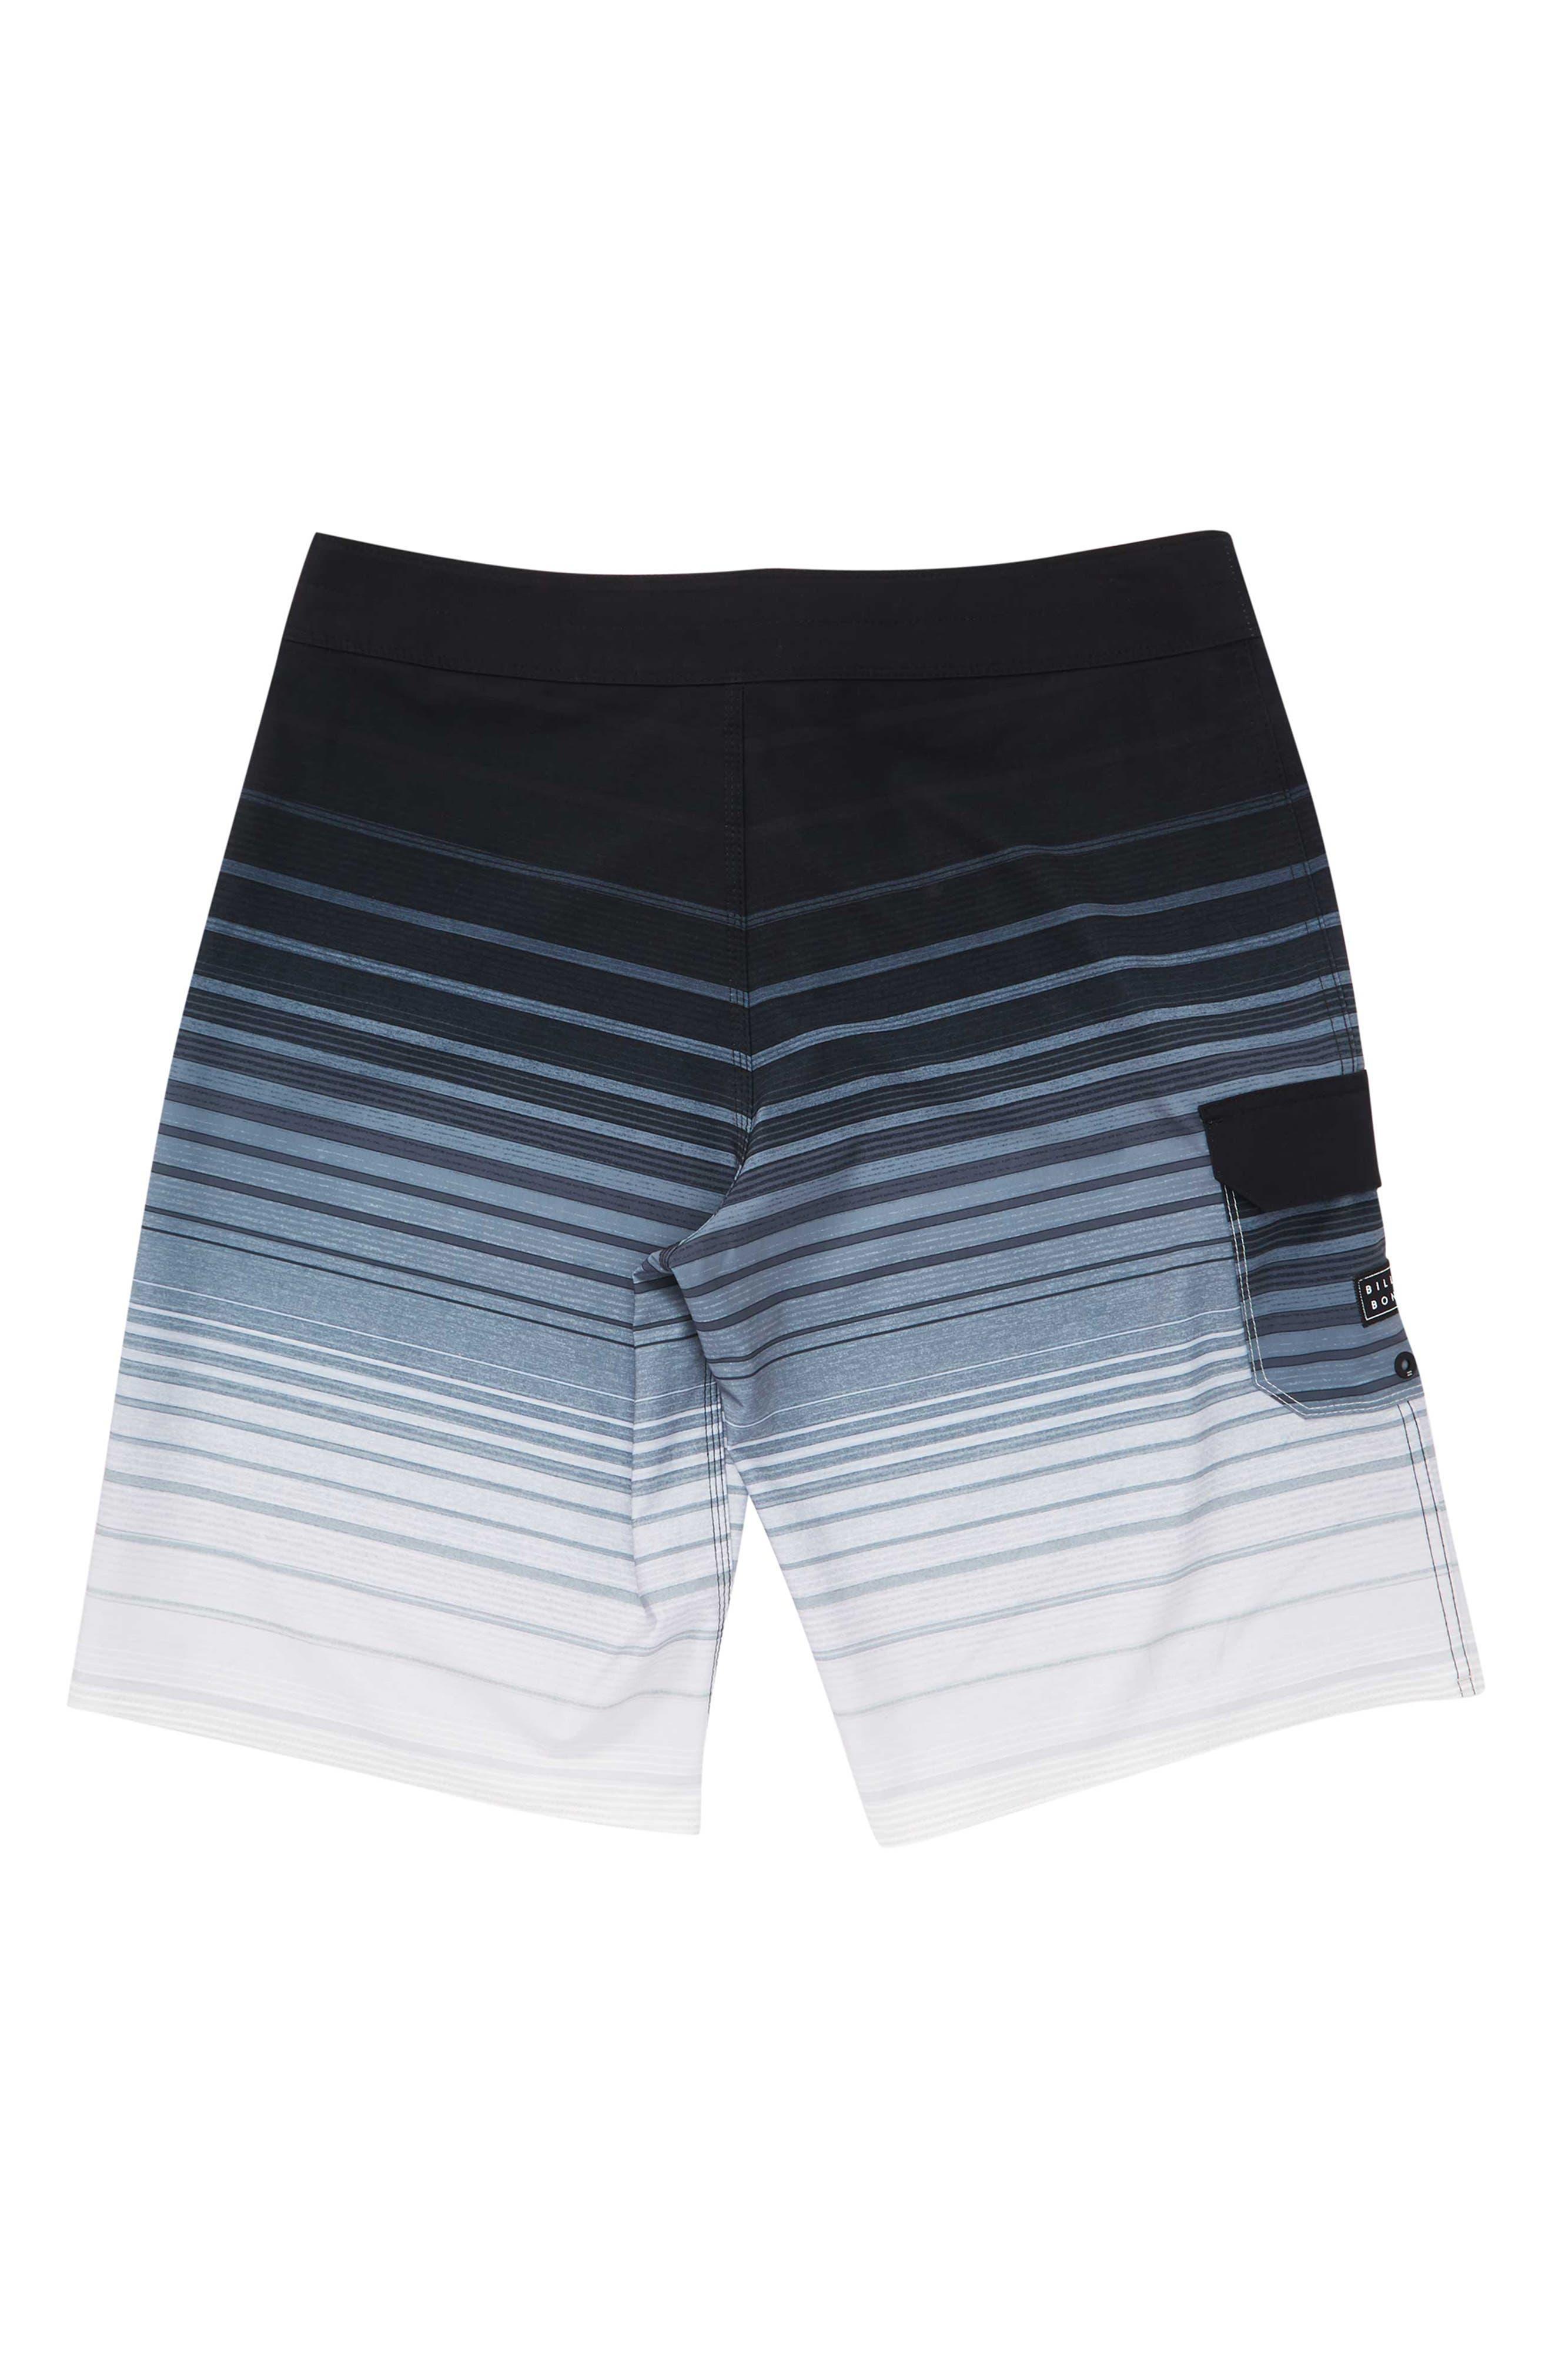 All Day Pro Board Shorts,                             Alternate thumbnail 2, color,                             BLACK